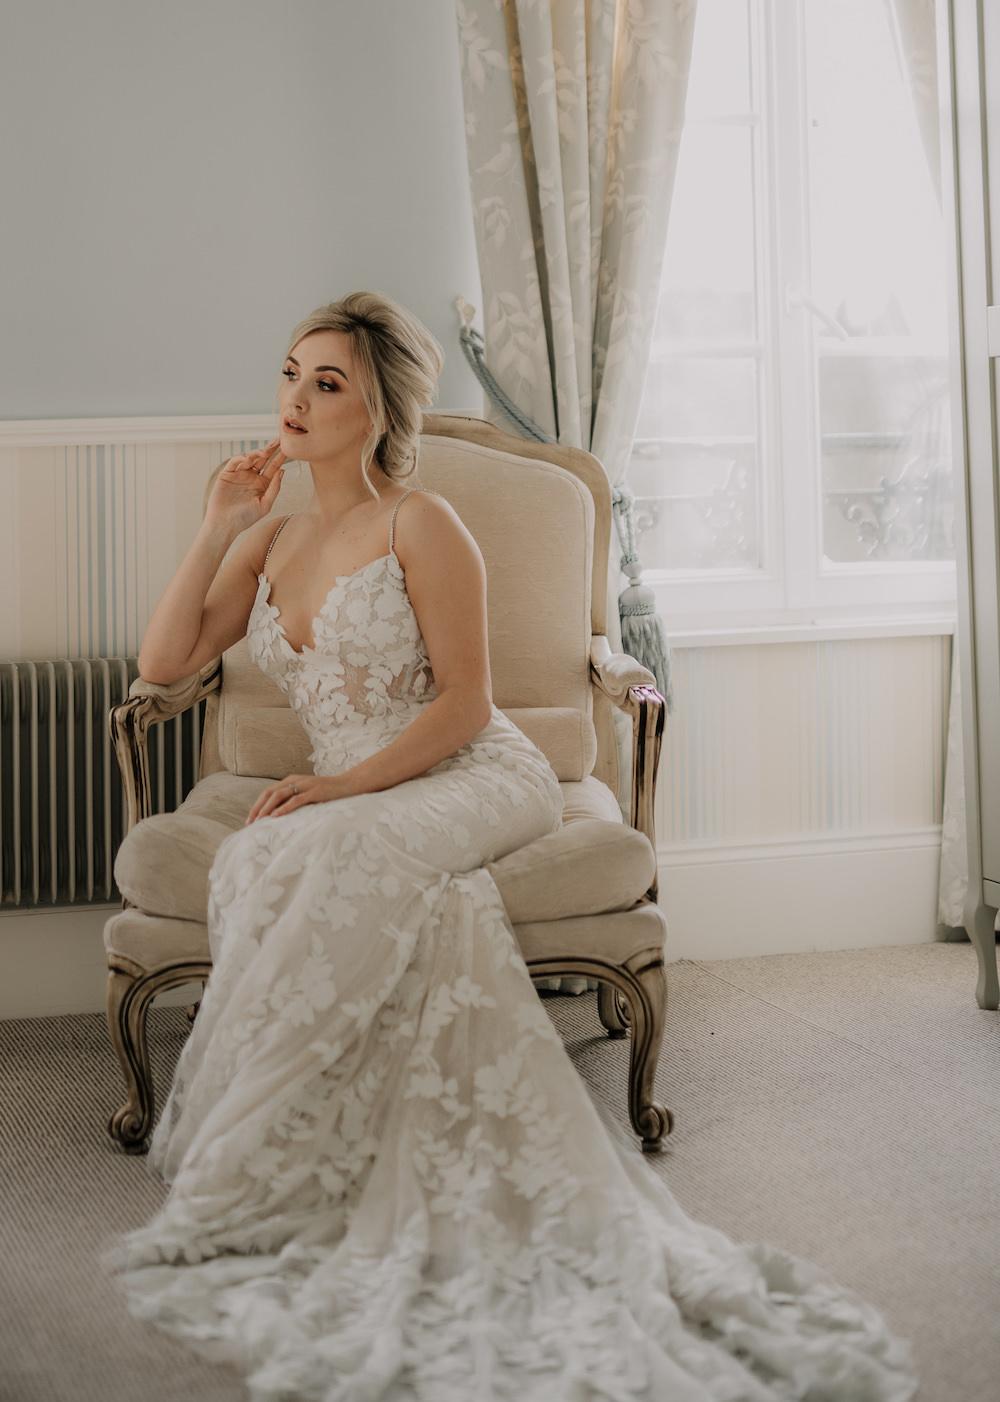 Dress Gown Bride Bridal Lace Fit Flare Train France Elopement Ideas Pierra G Photography